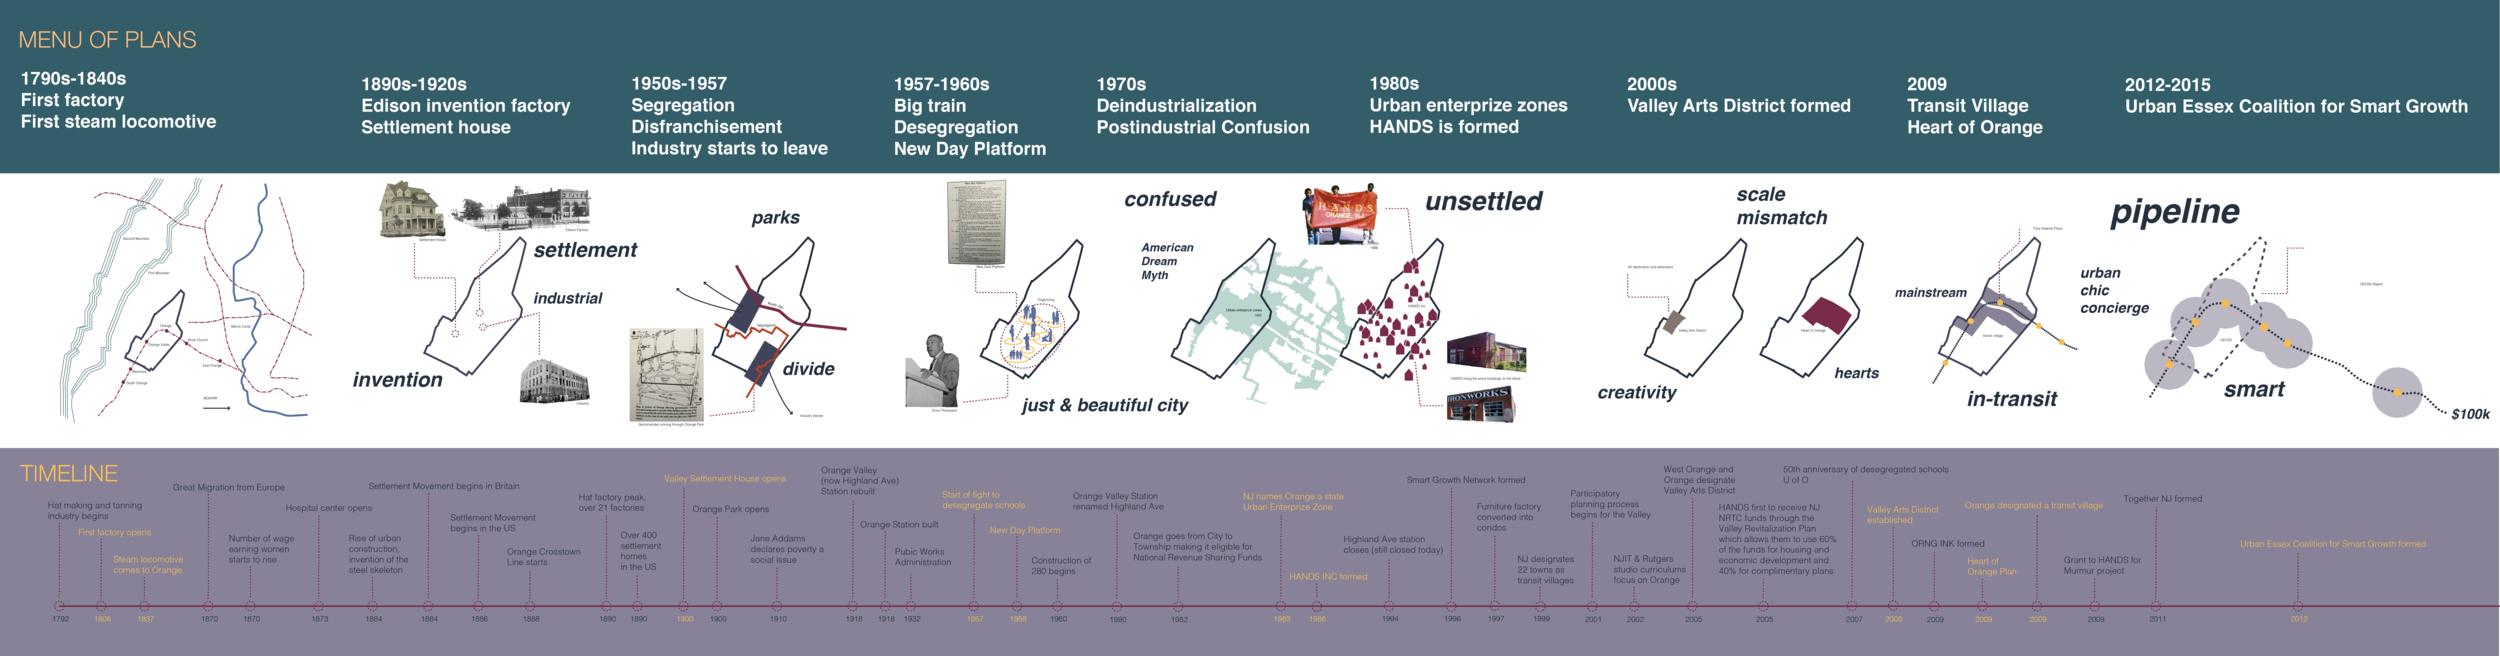 Historical timeline of development plans and community organizing efforts in Orange, NJ